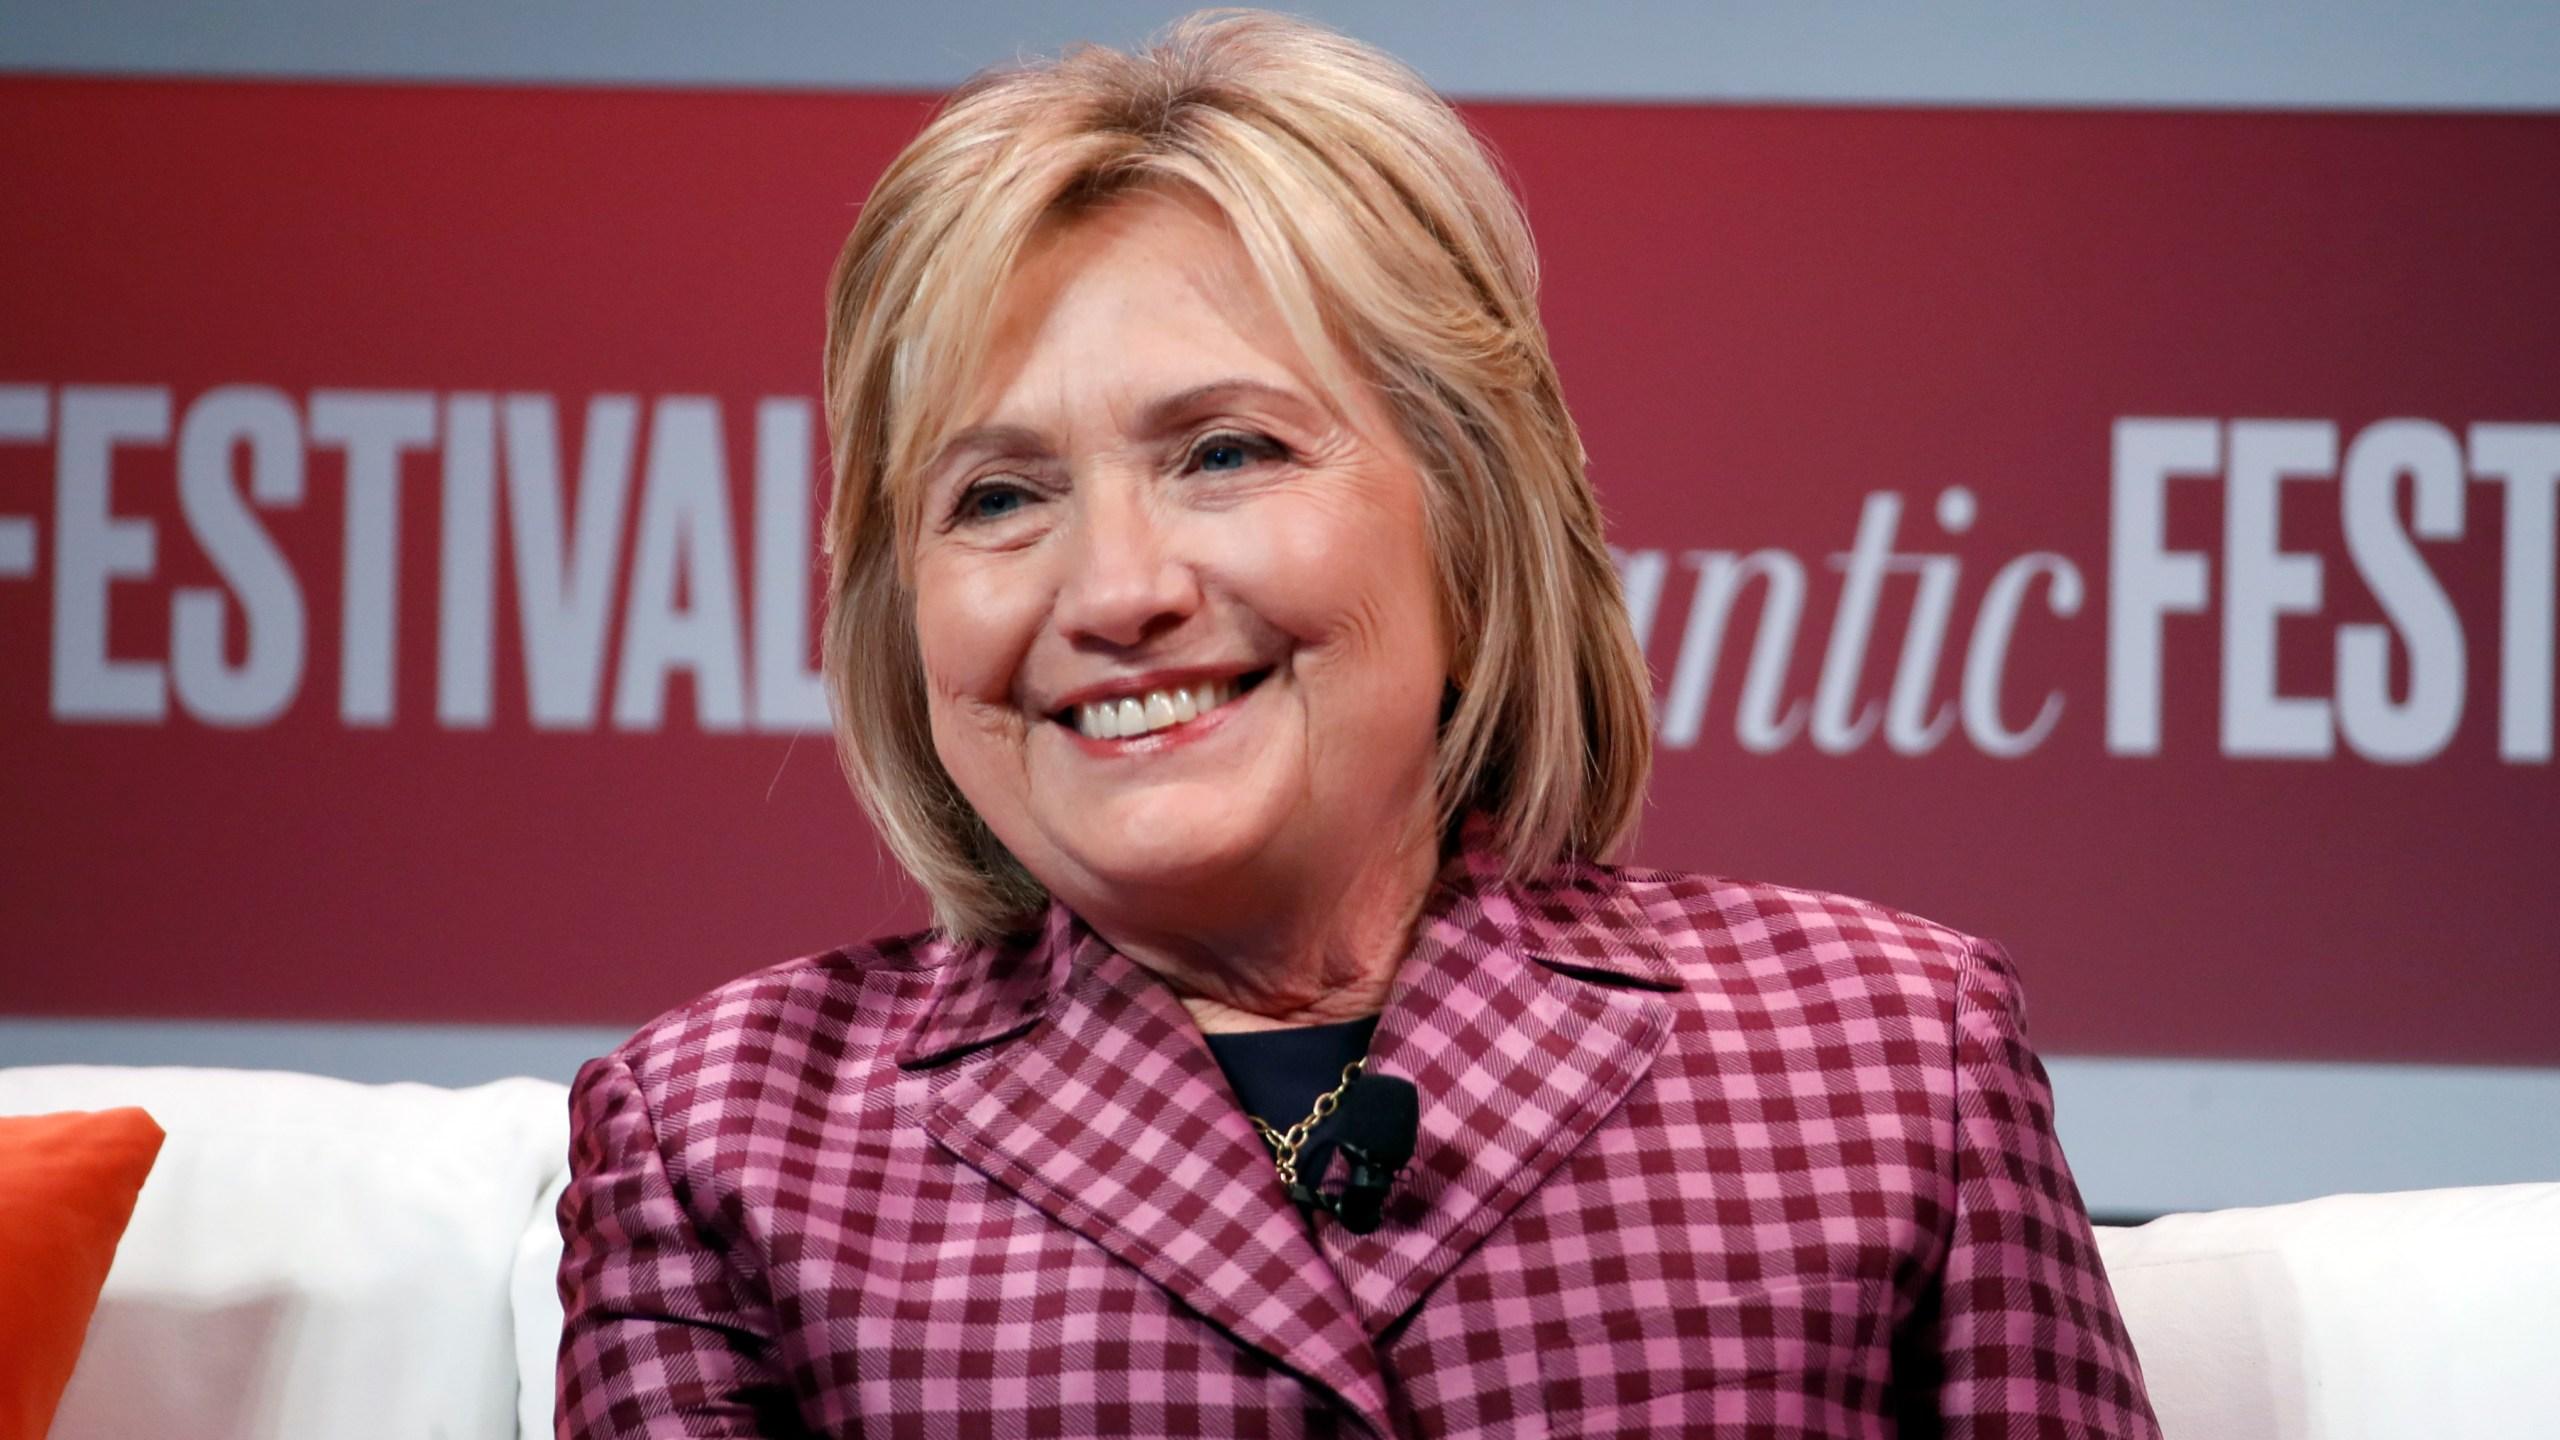 Hillary_Clinton_Crash_81666-159532.jpg26647610